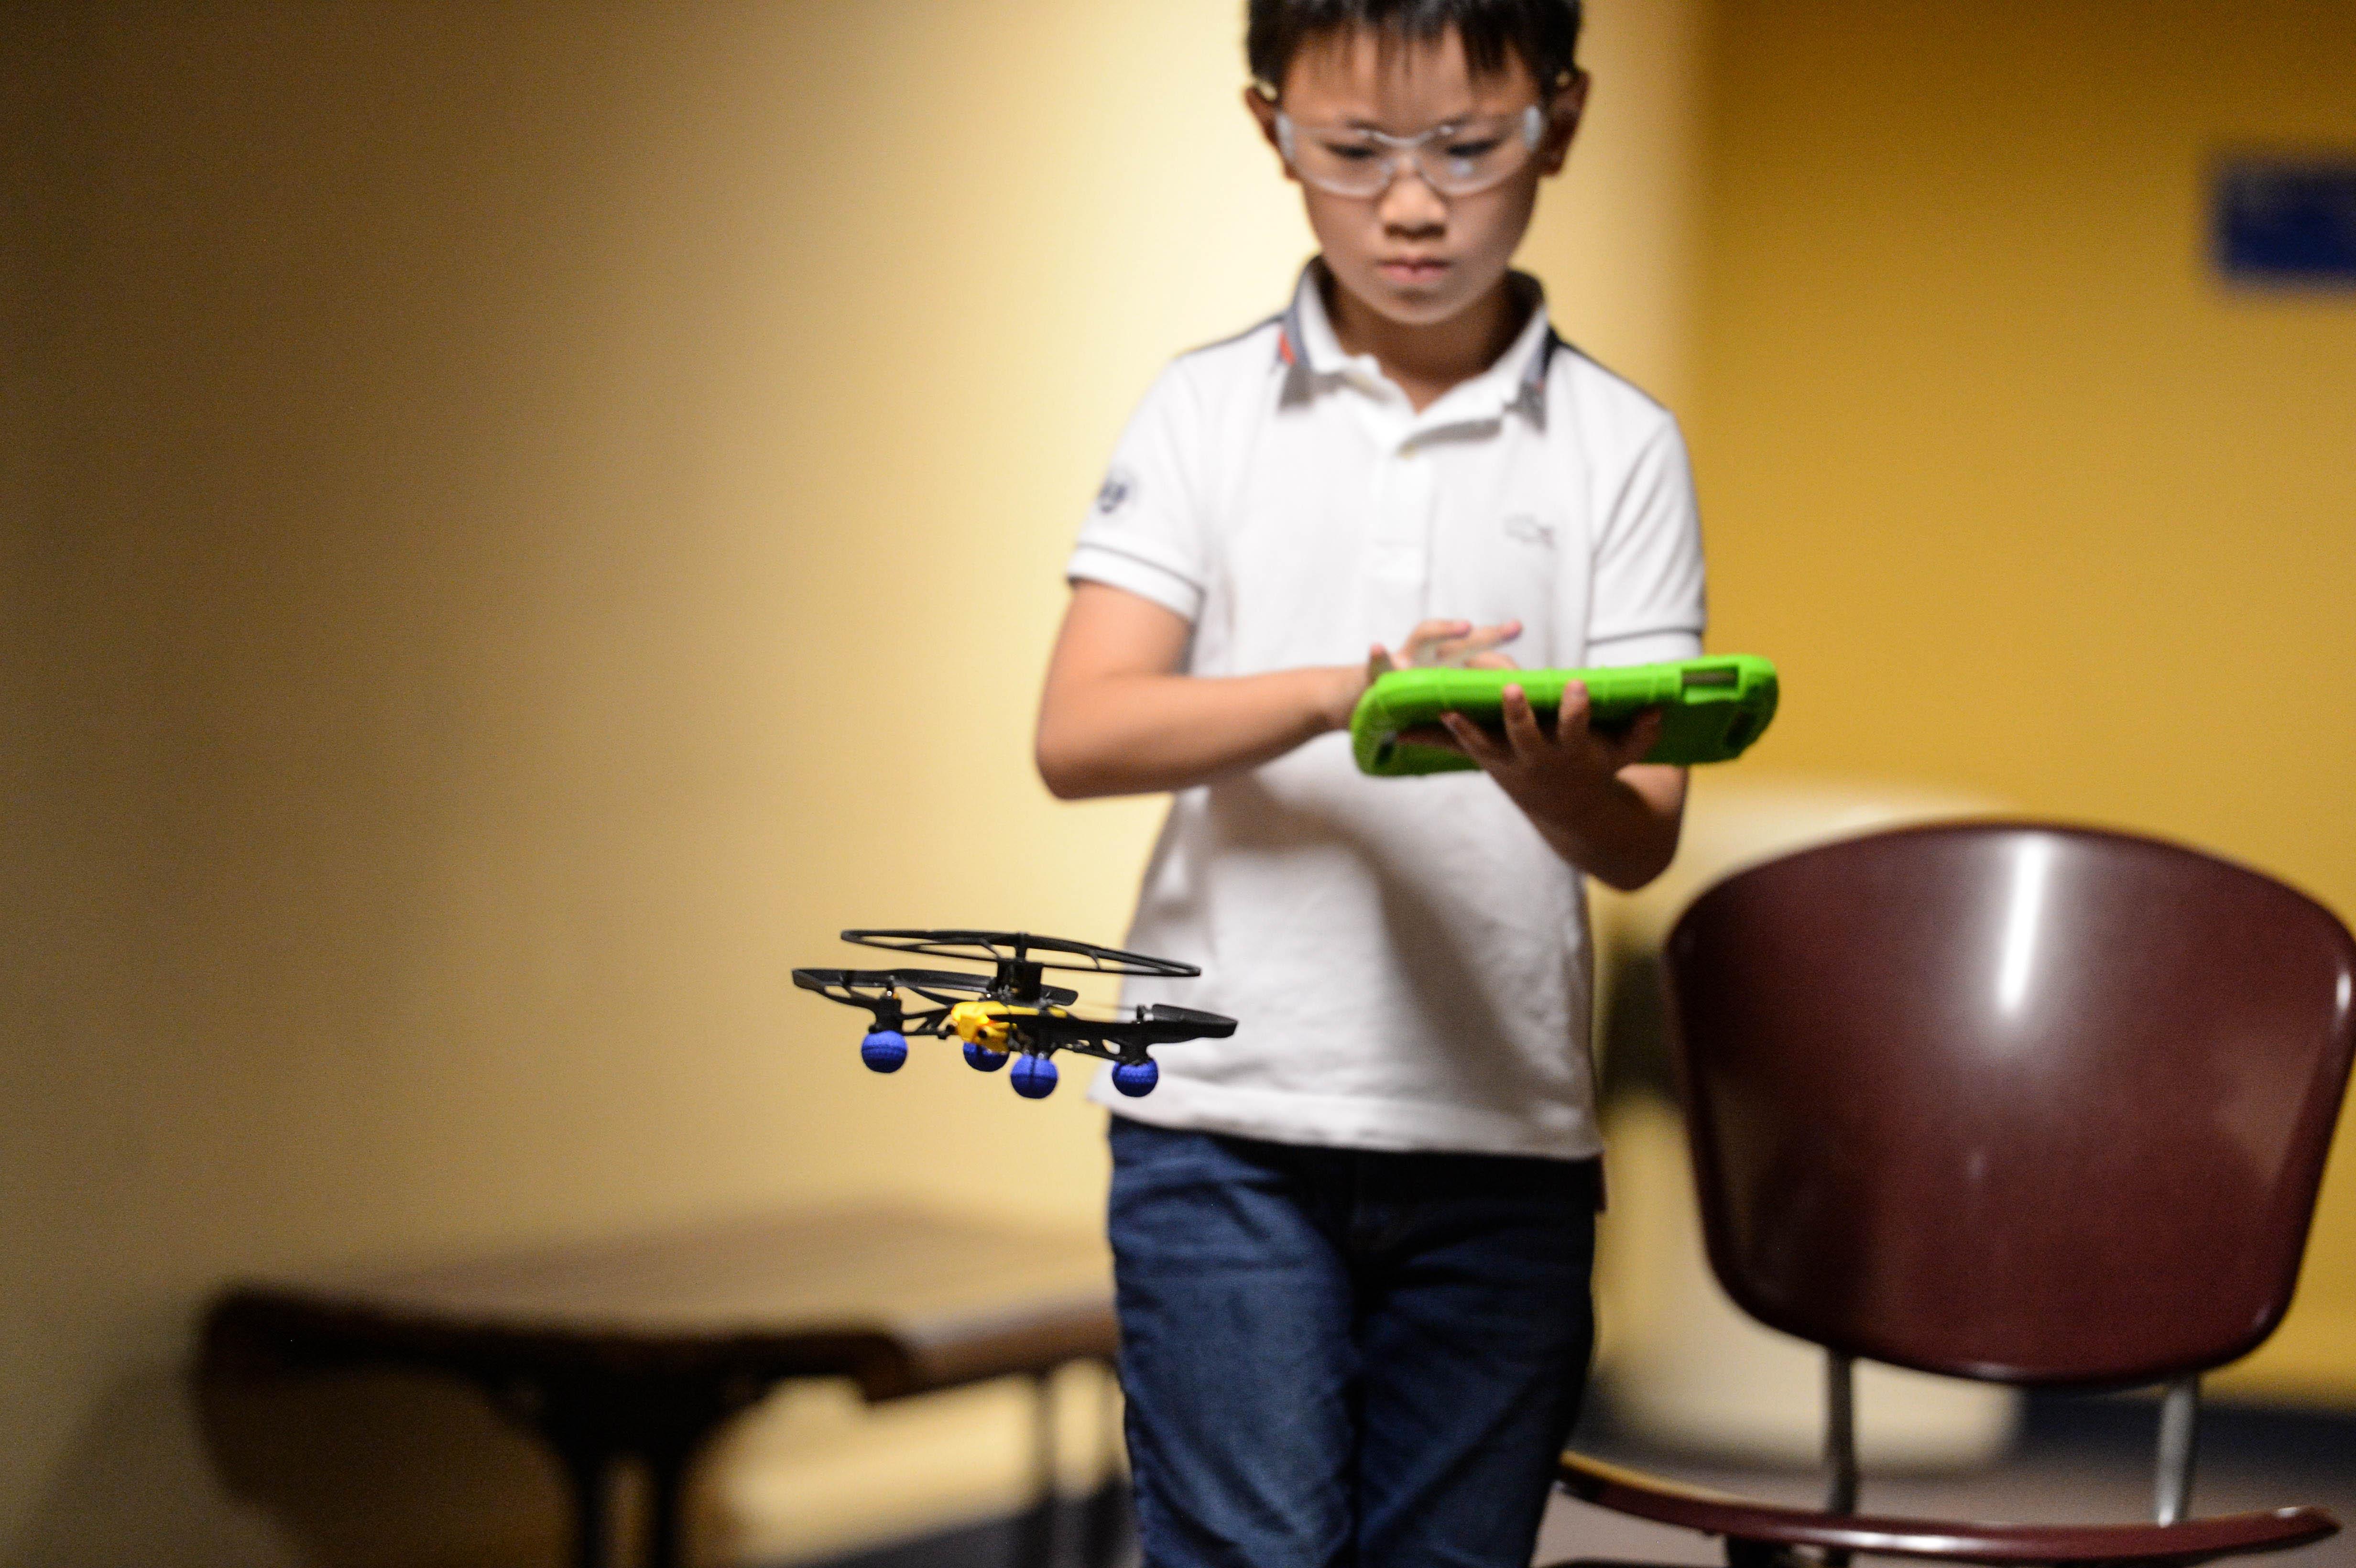 Elementary School Programs – Shady Side Academy Intended For Foxchapel Elementary School Calendar 2021 2020